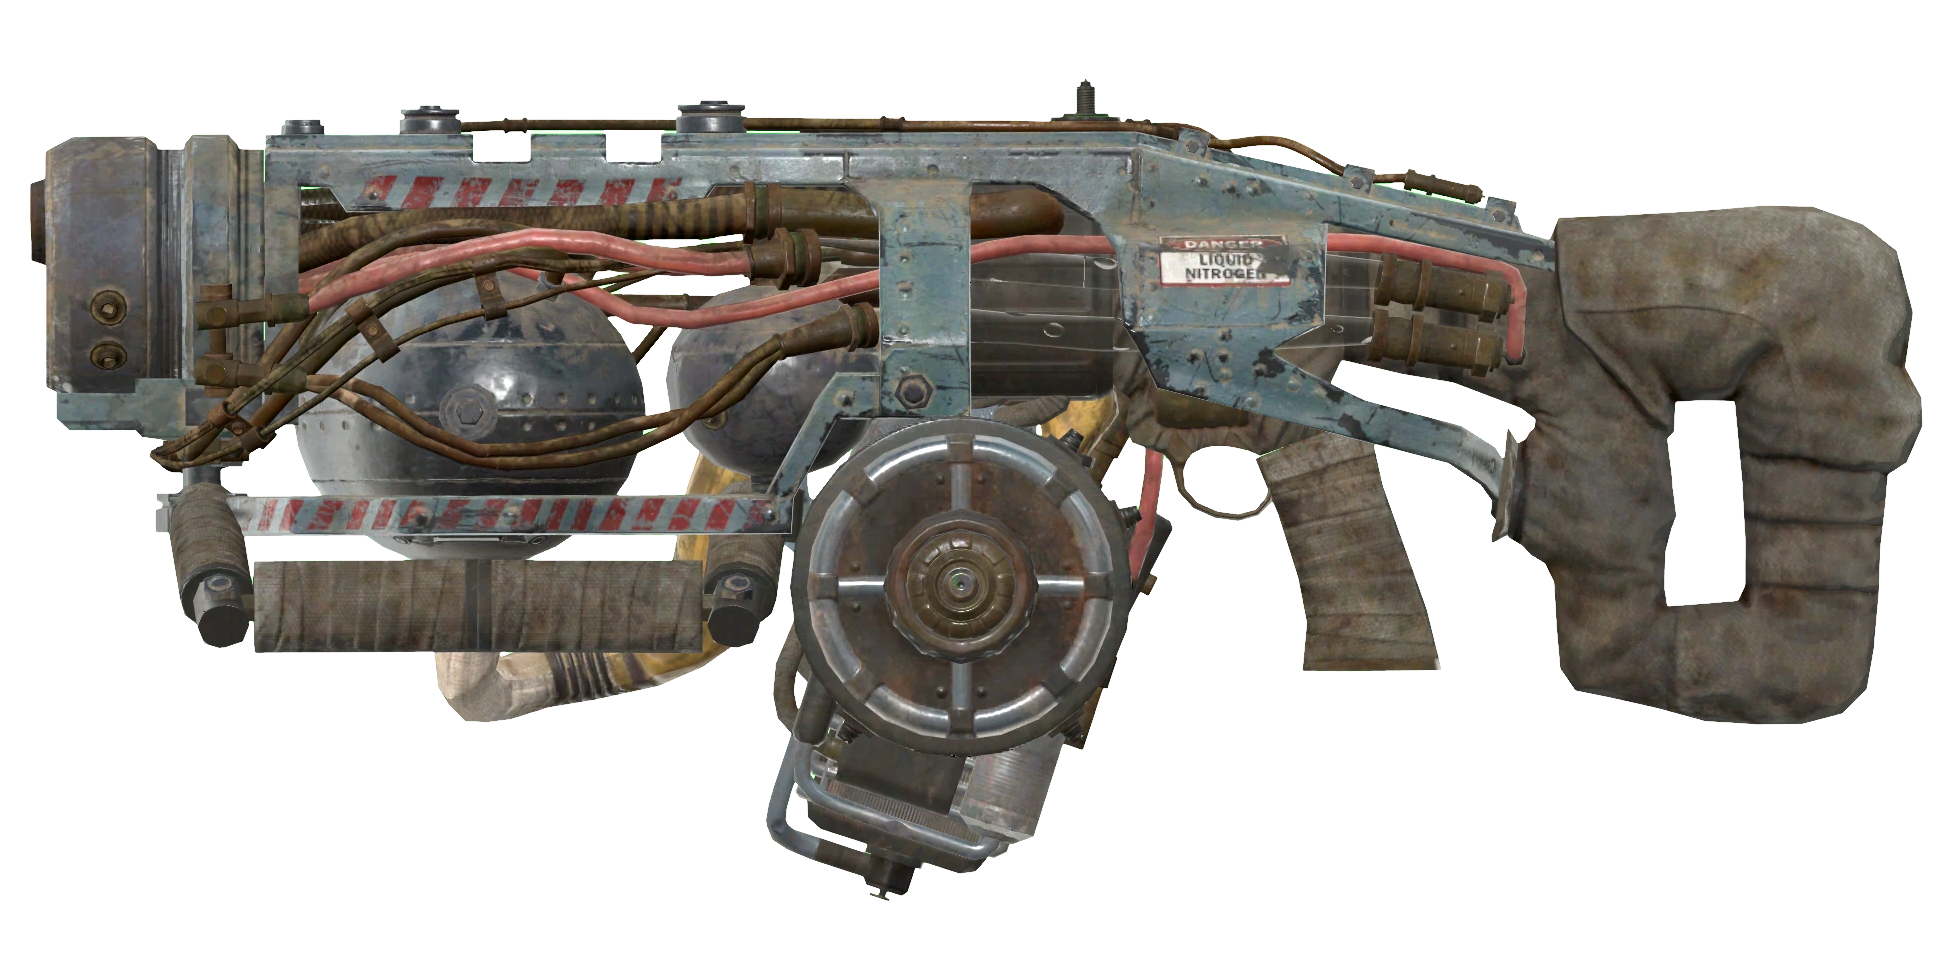 Cryolator (Fallout 76)